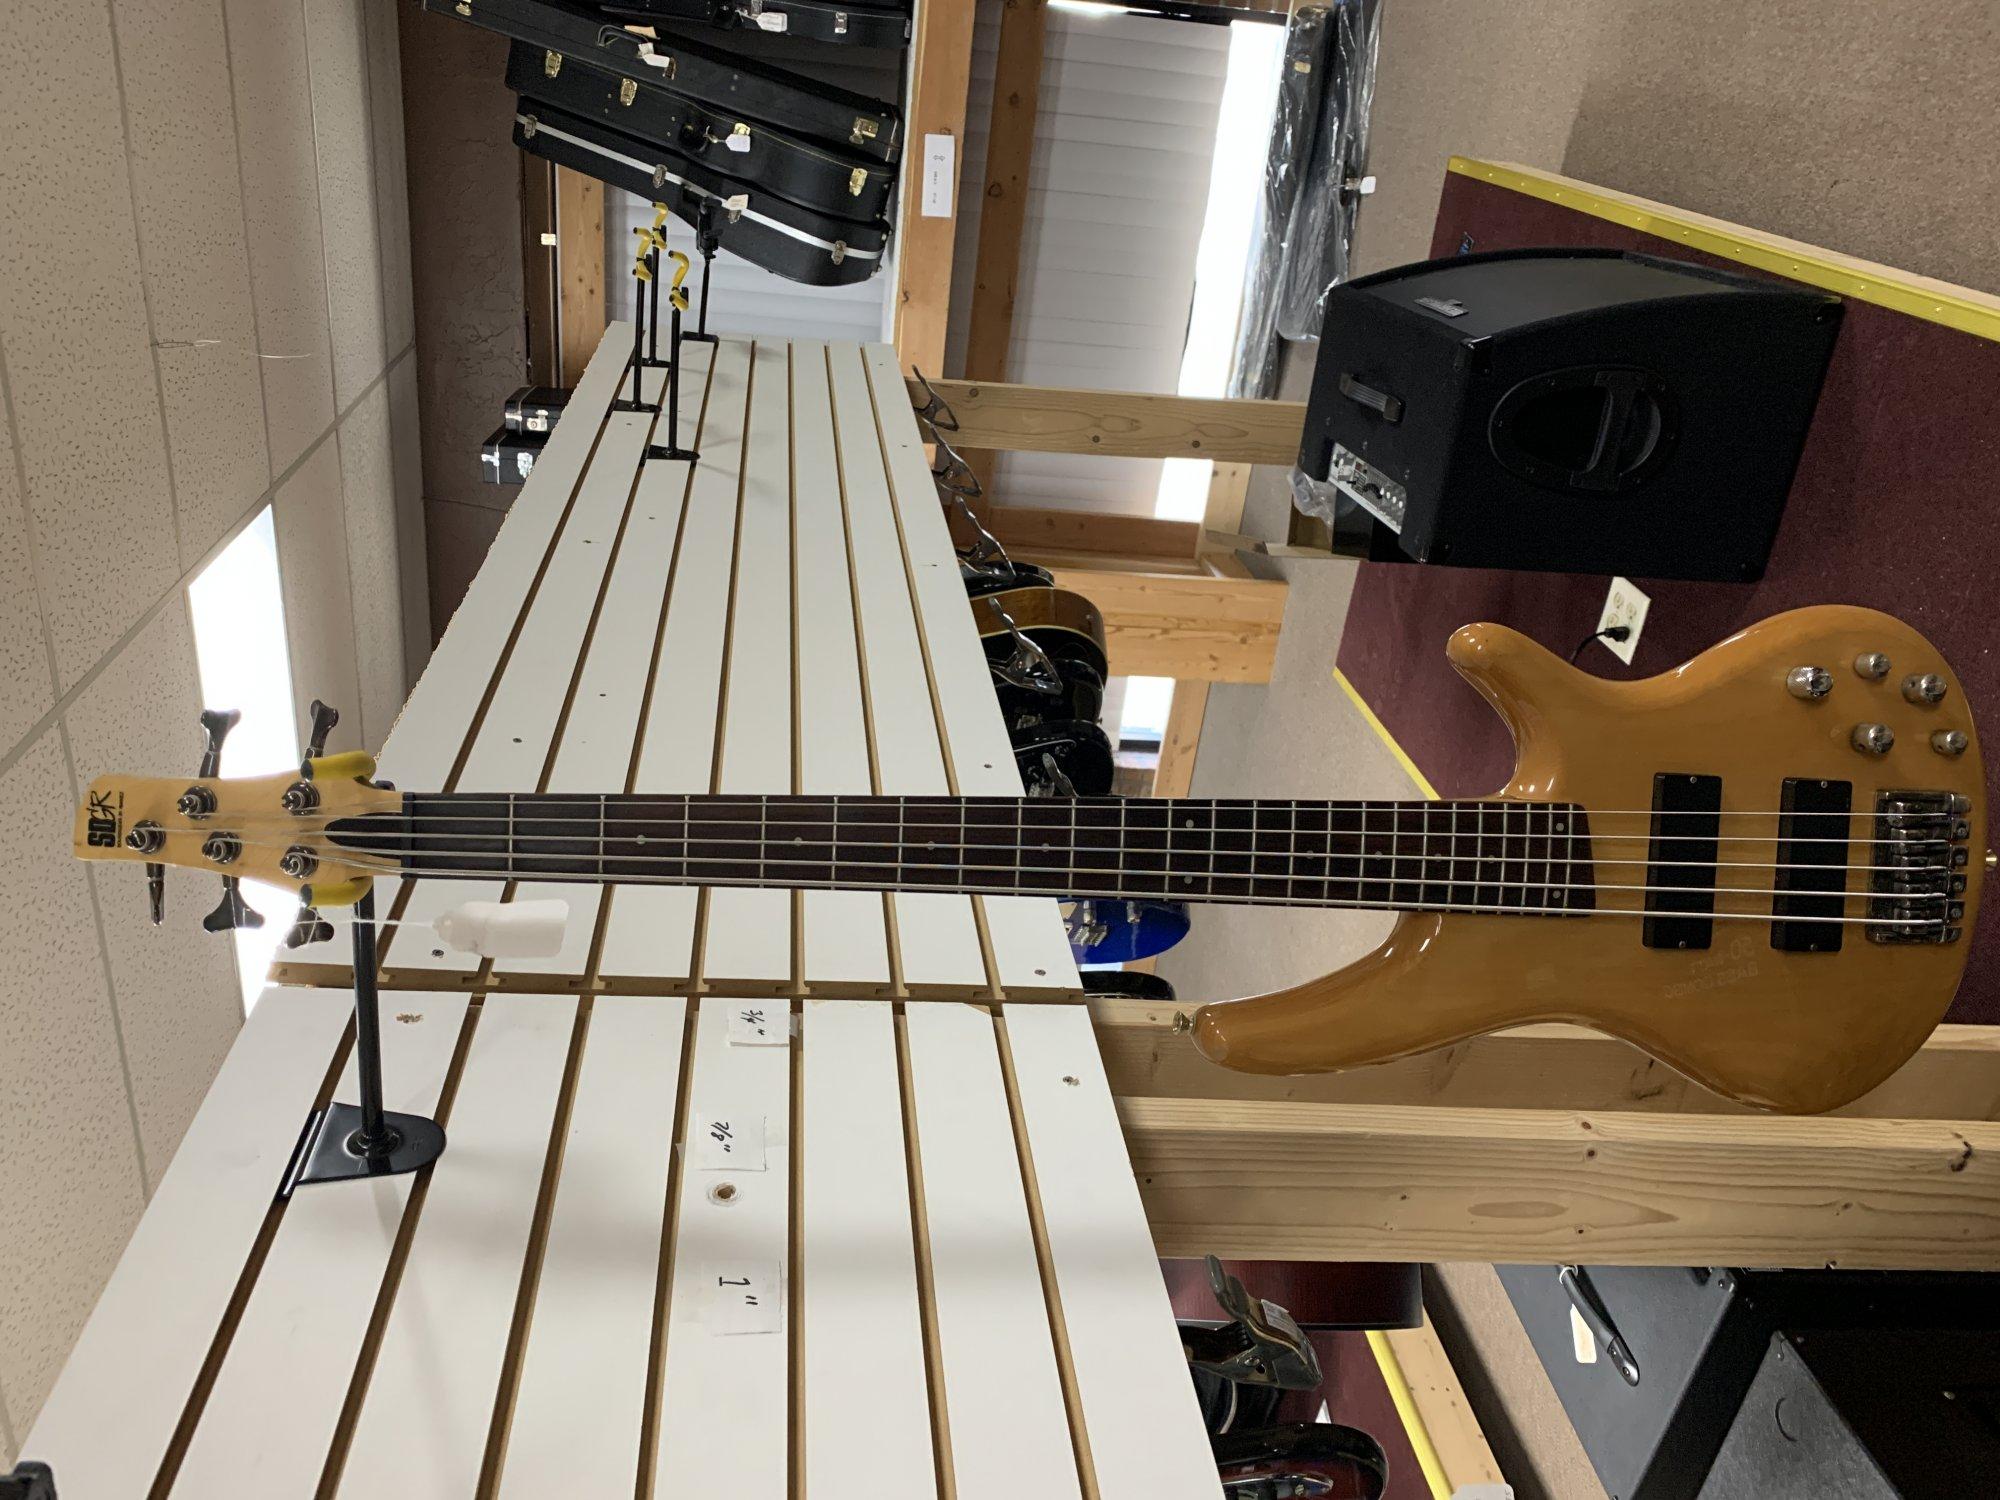 Used Ibanez SDGR SR405 Bass guitar